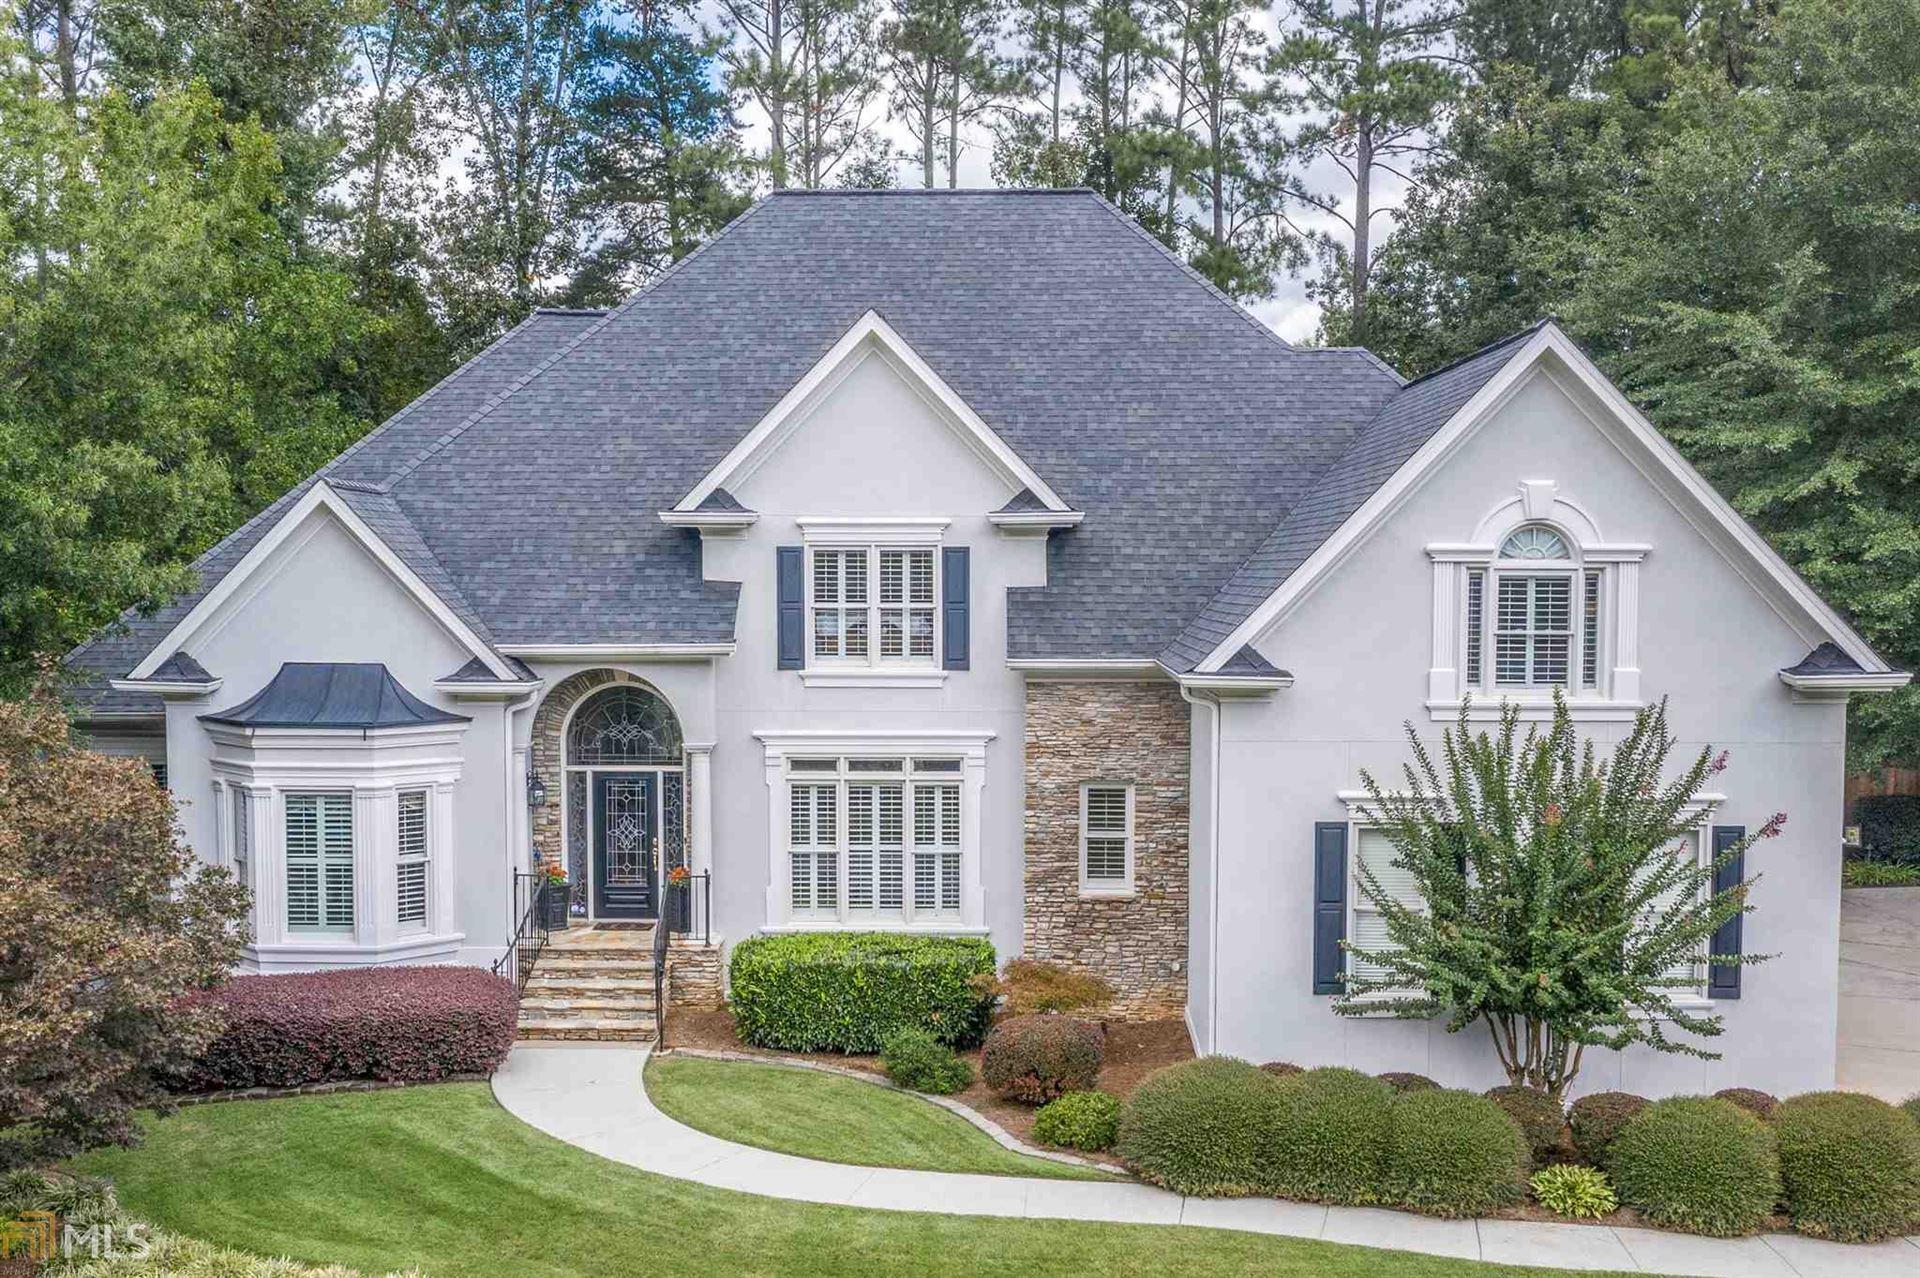 1371 Annapolis Way, Grayson, GA 30017 - MLS#: 8911770